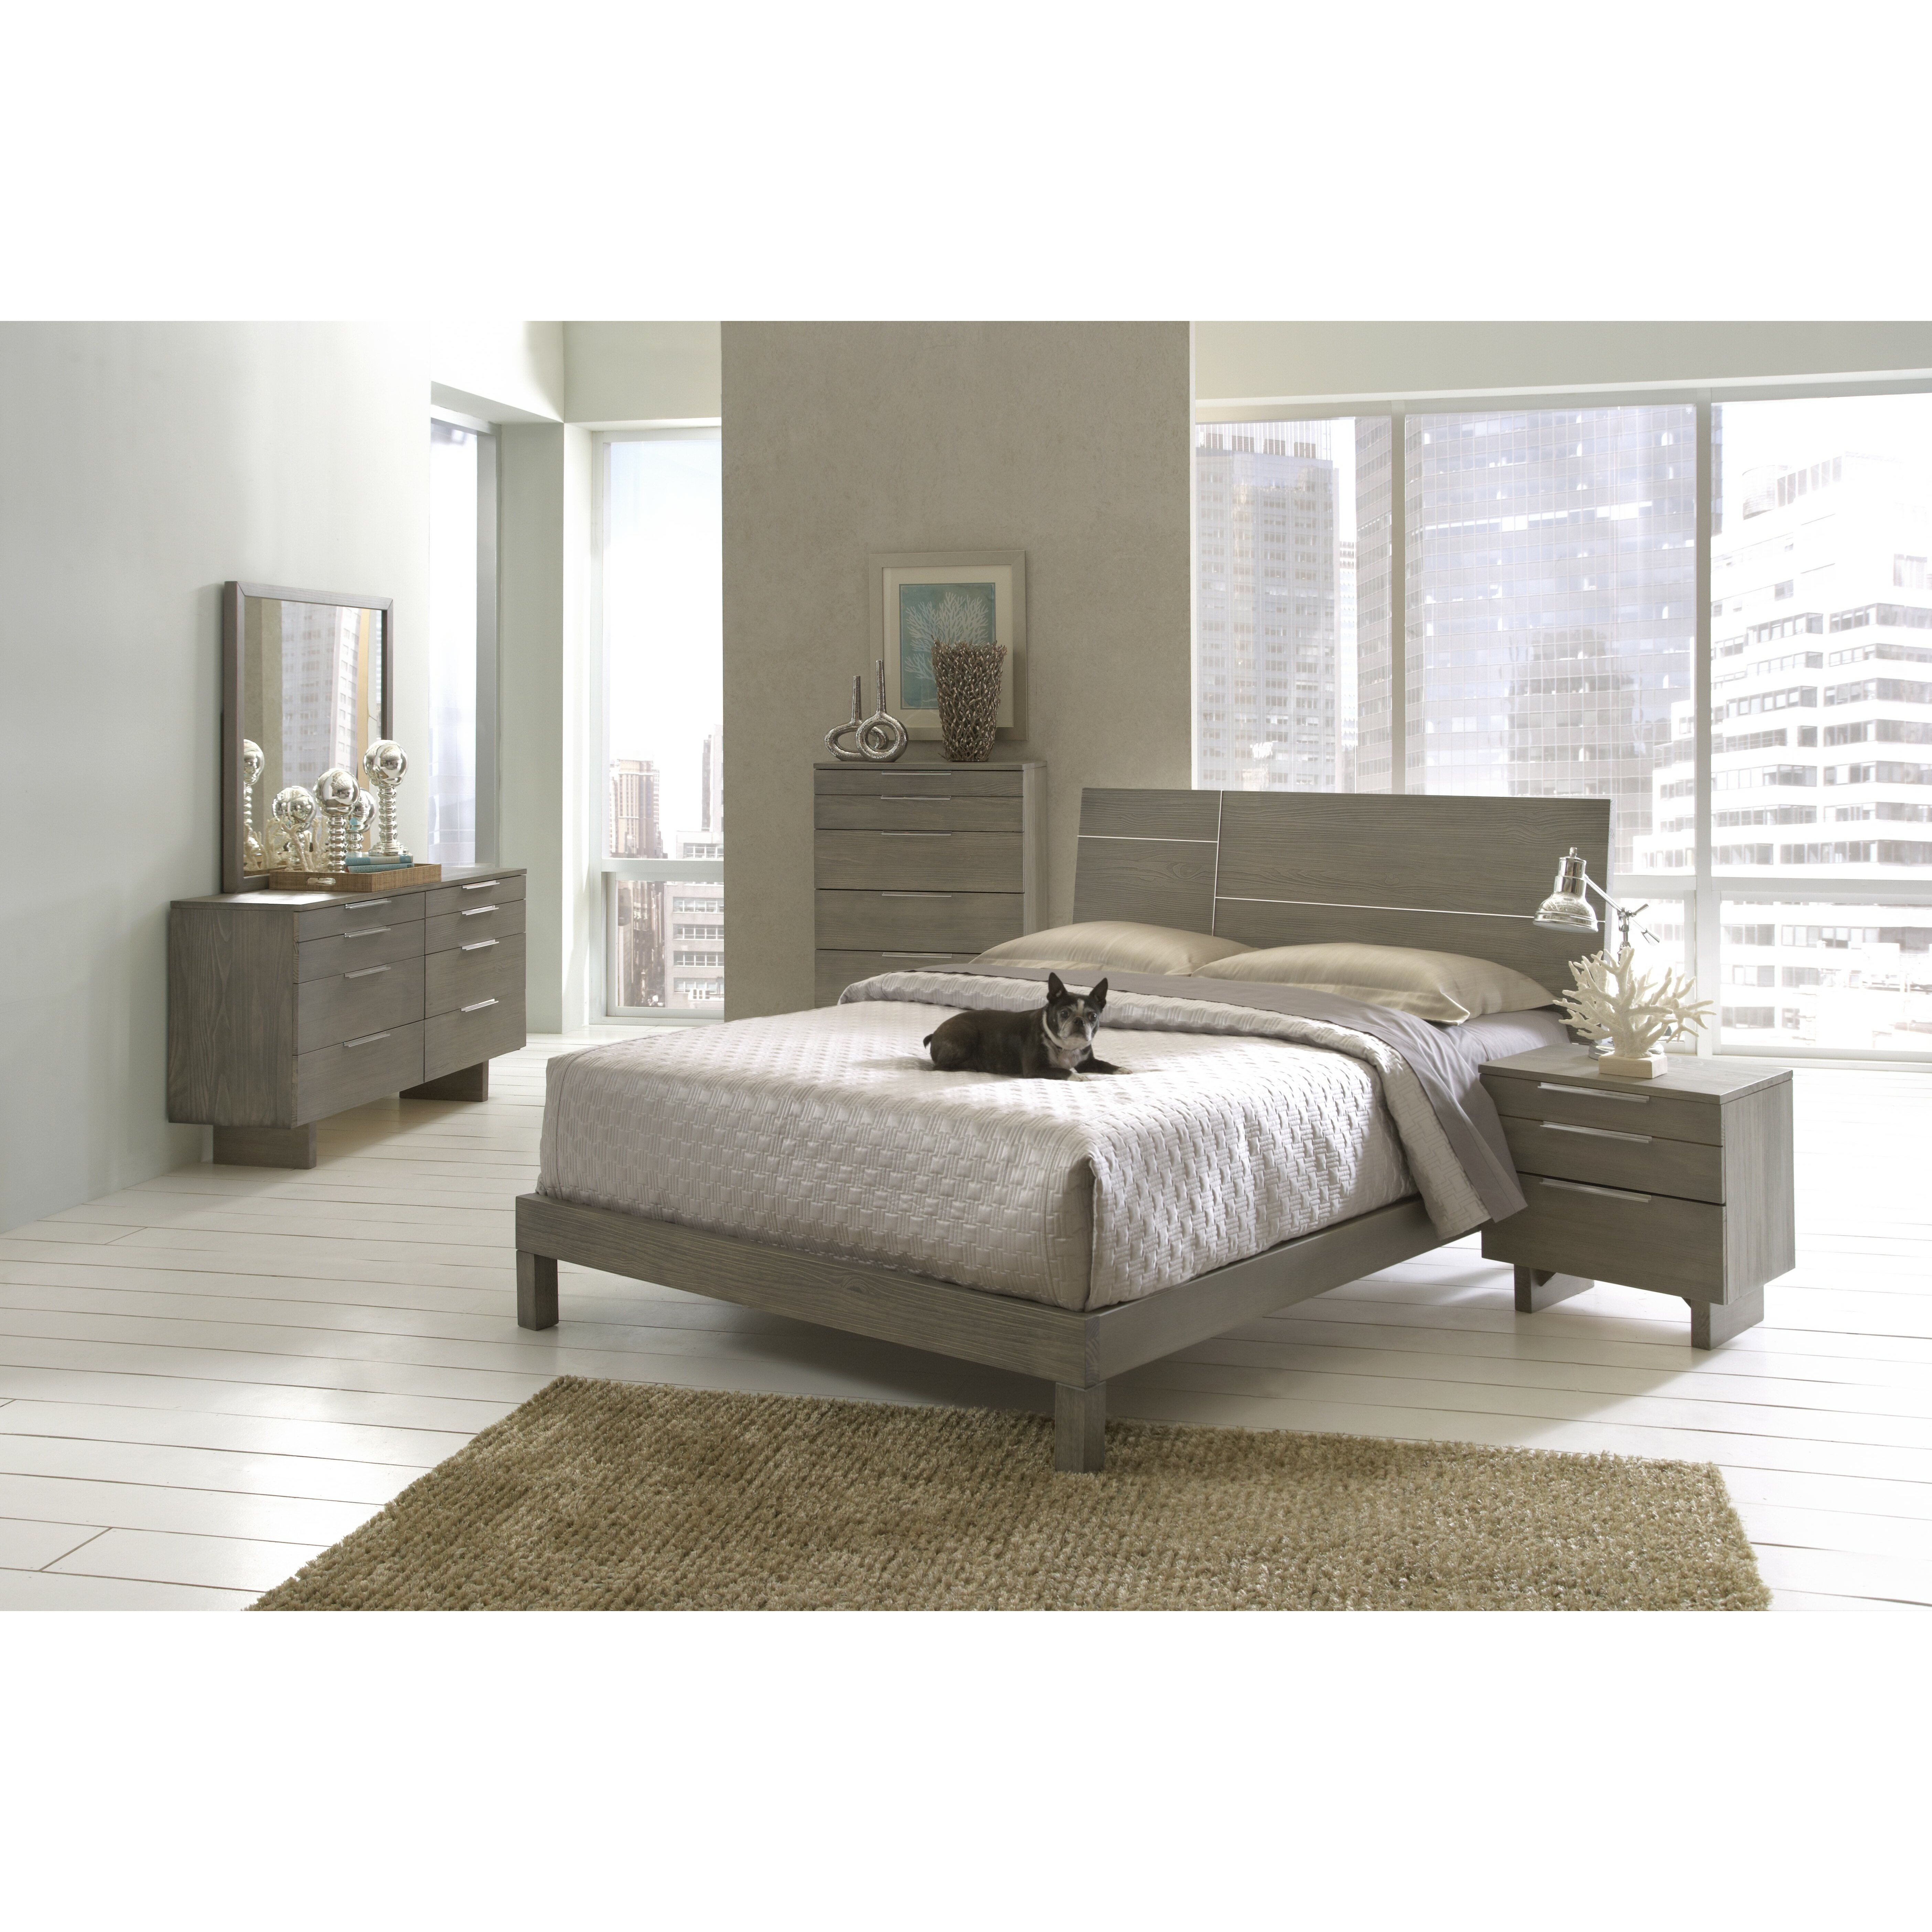 bedroom sets. gallery of black king size bedroom sets bed queen